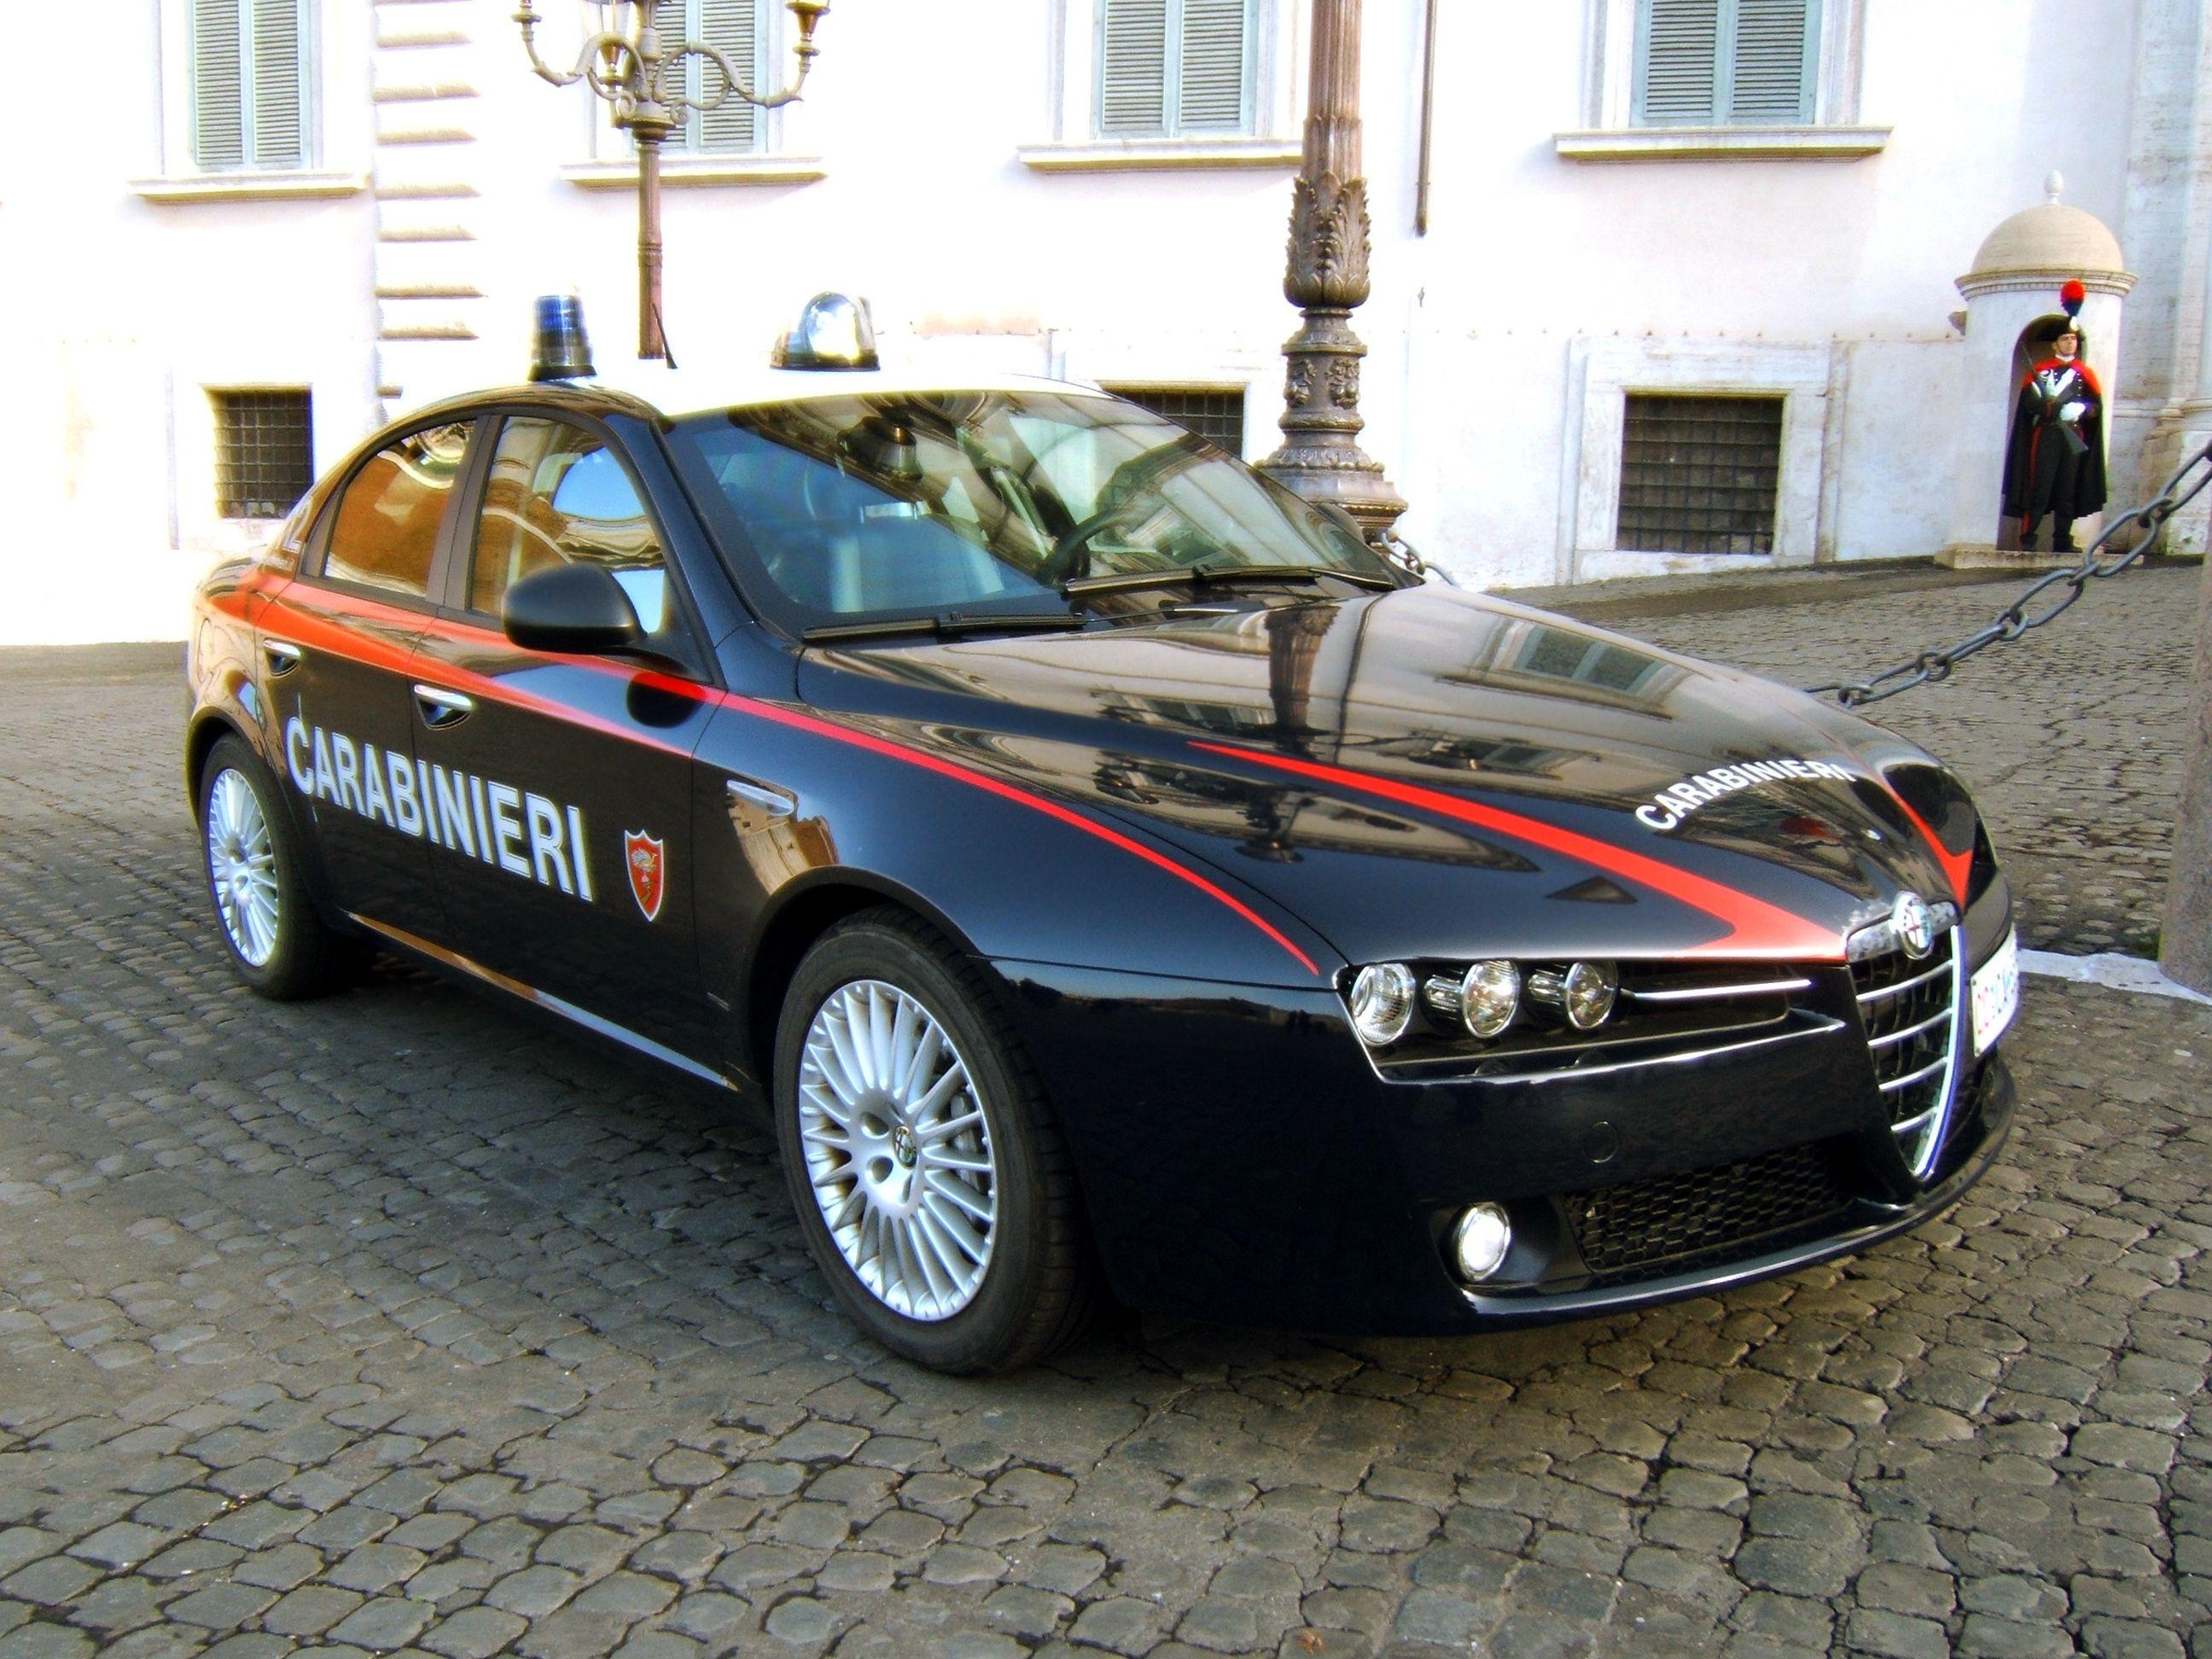 Carabinieri roma pusher